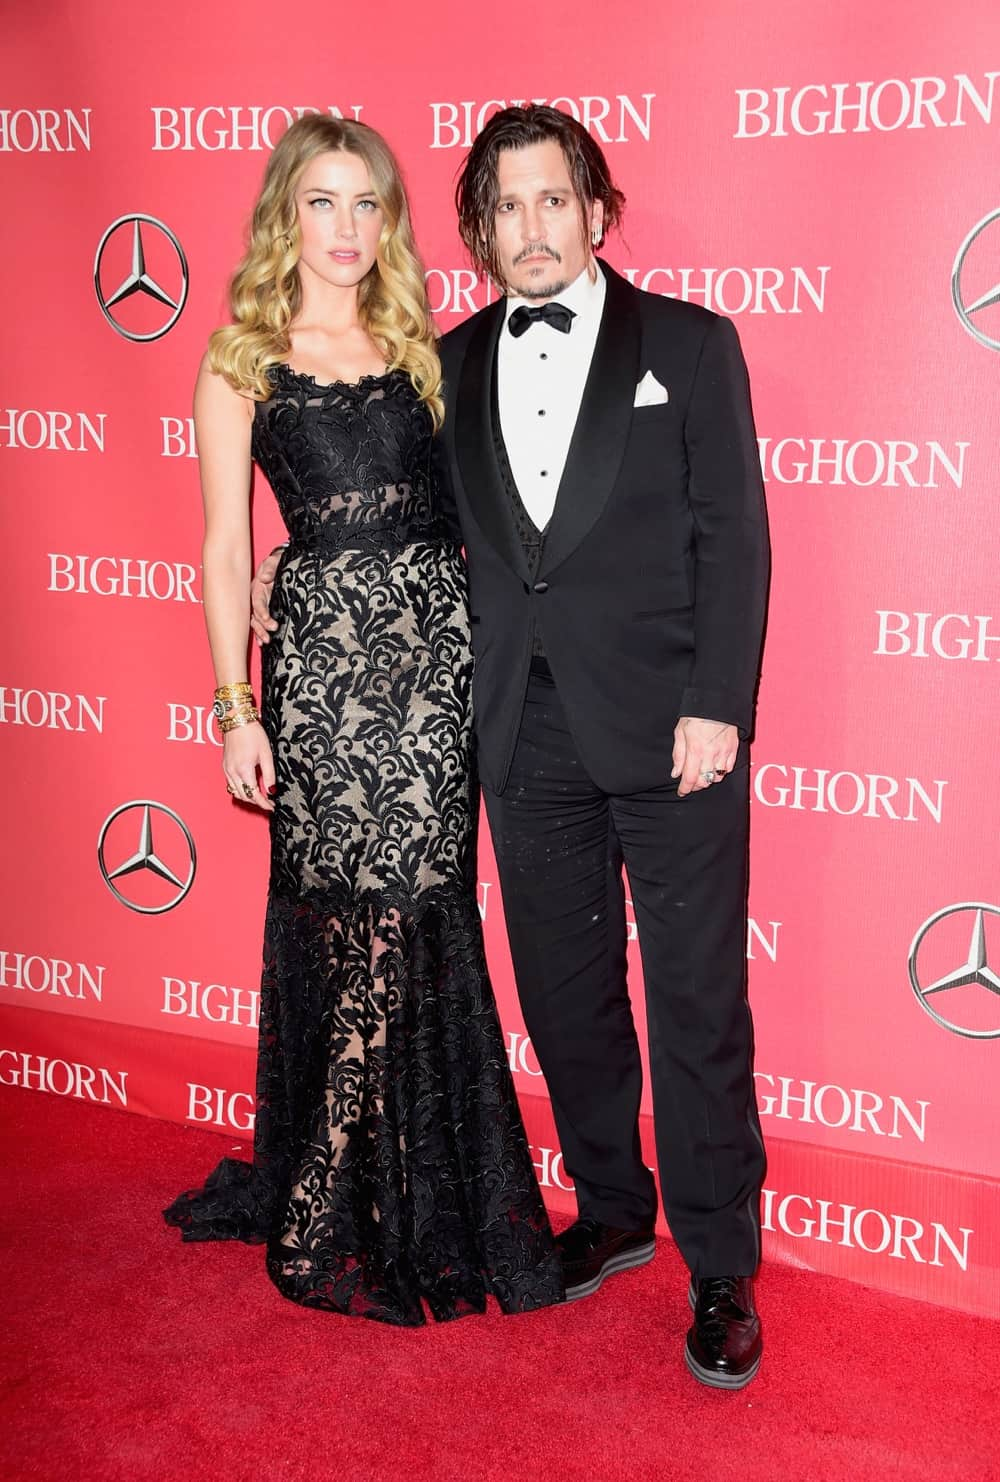 Amber Heard and Johnny Depp 27th Annual Palm Springs International Film Festival Awards Gala - Arrivals